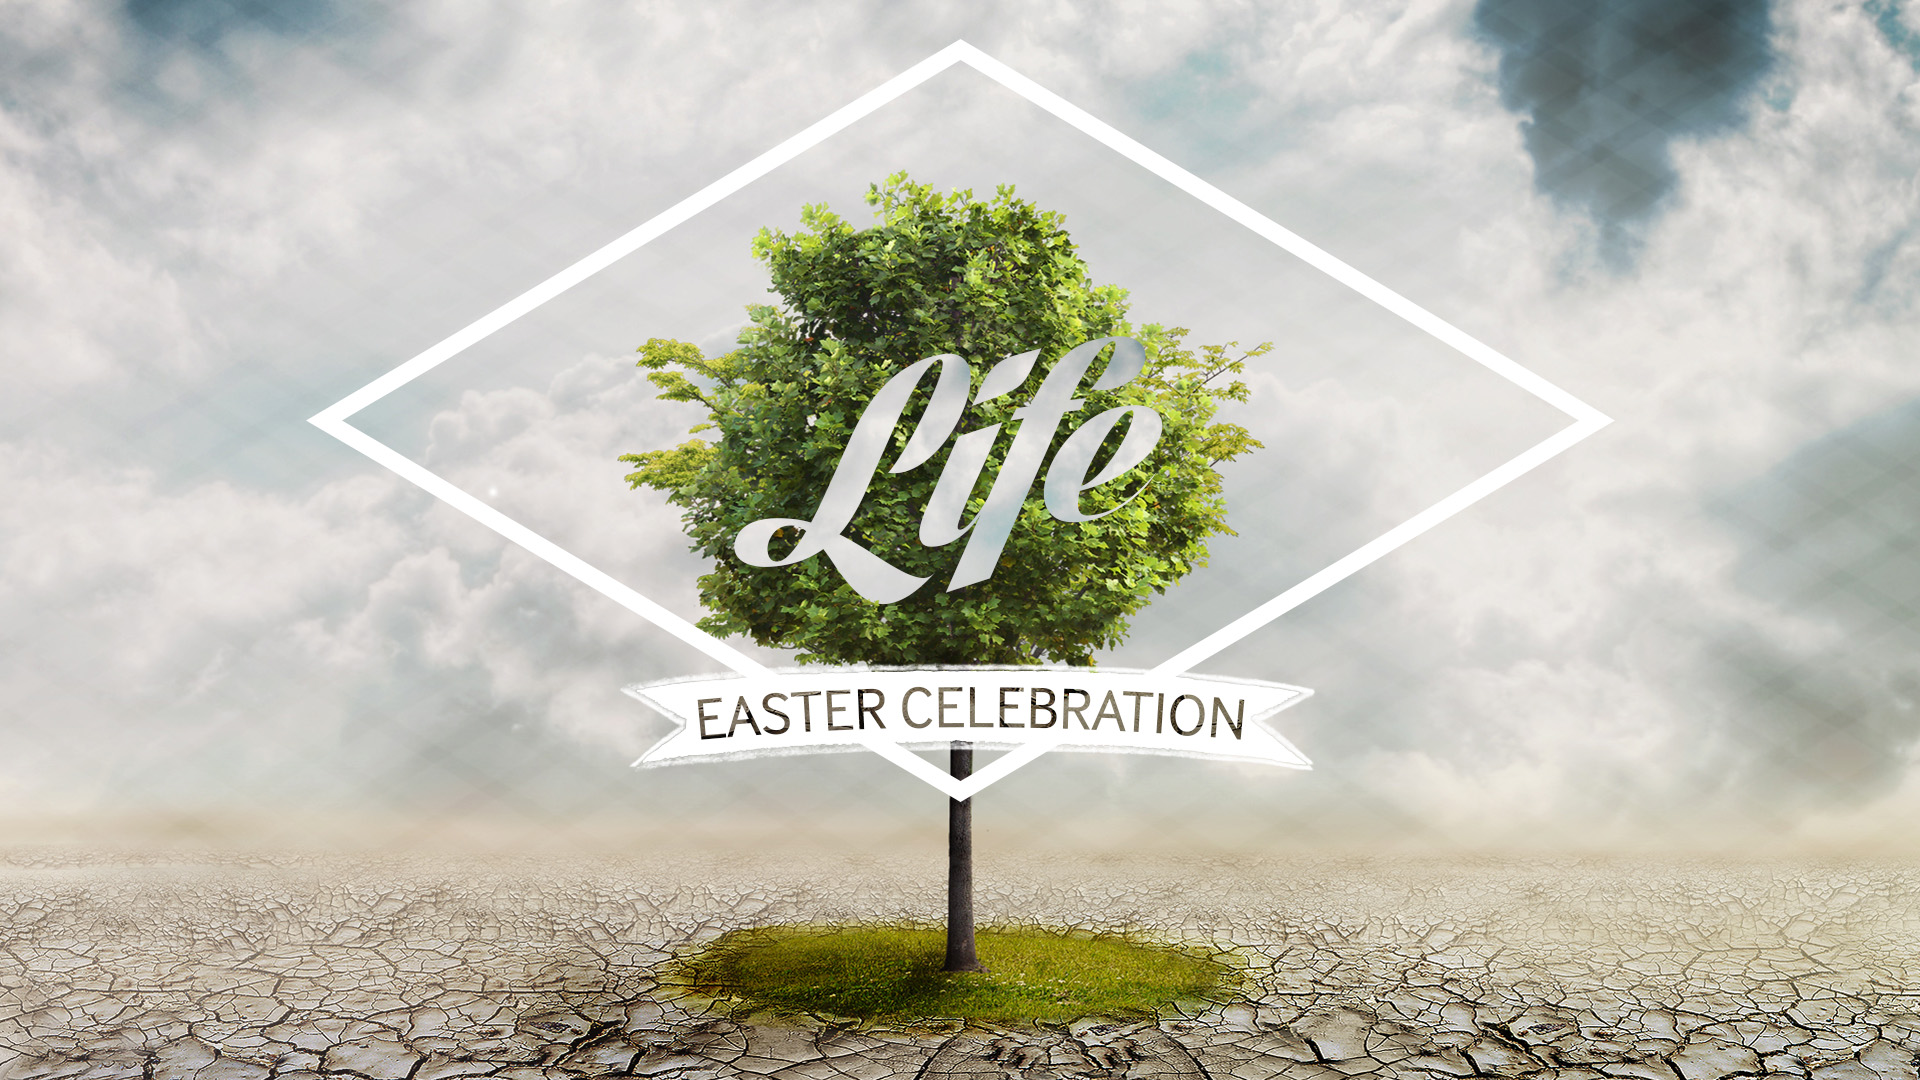 Life: An Easter Celebration (2015)